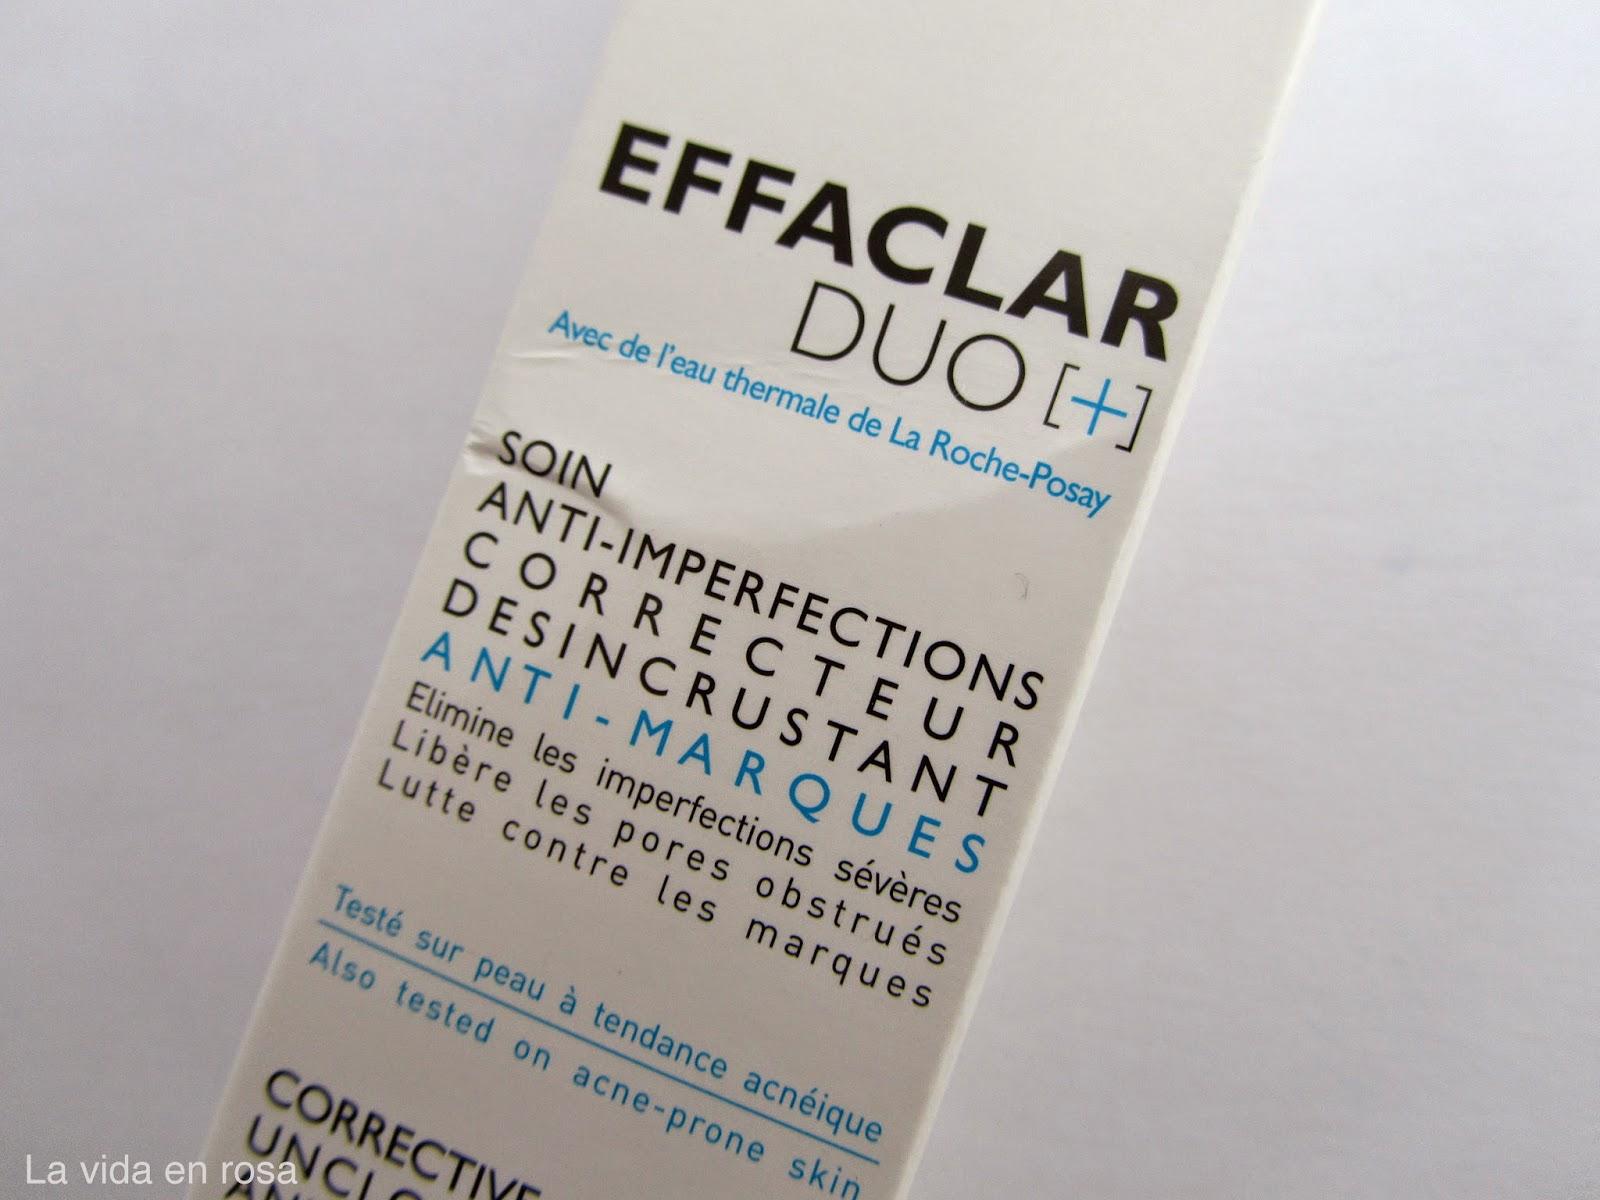 effaclar duo